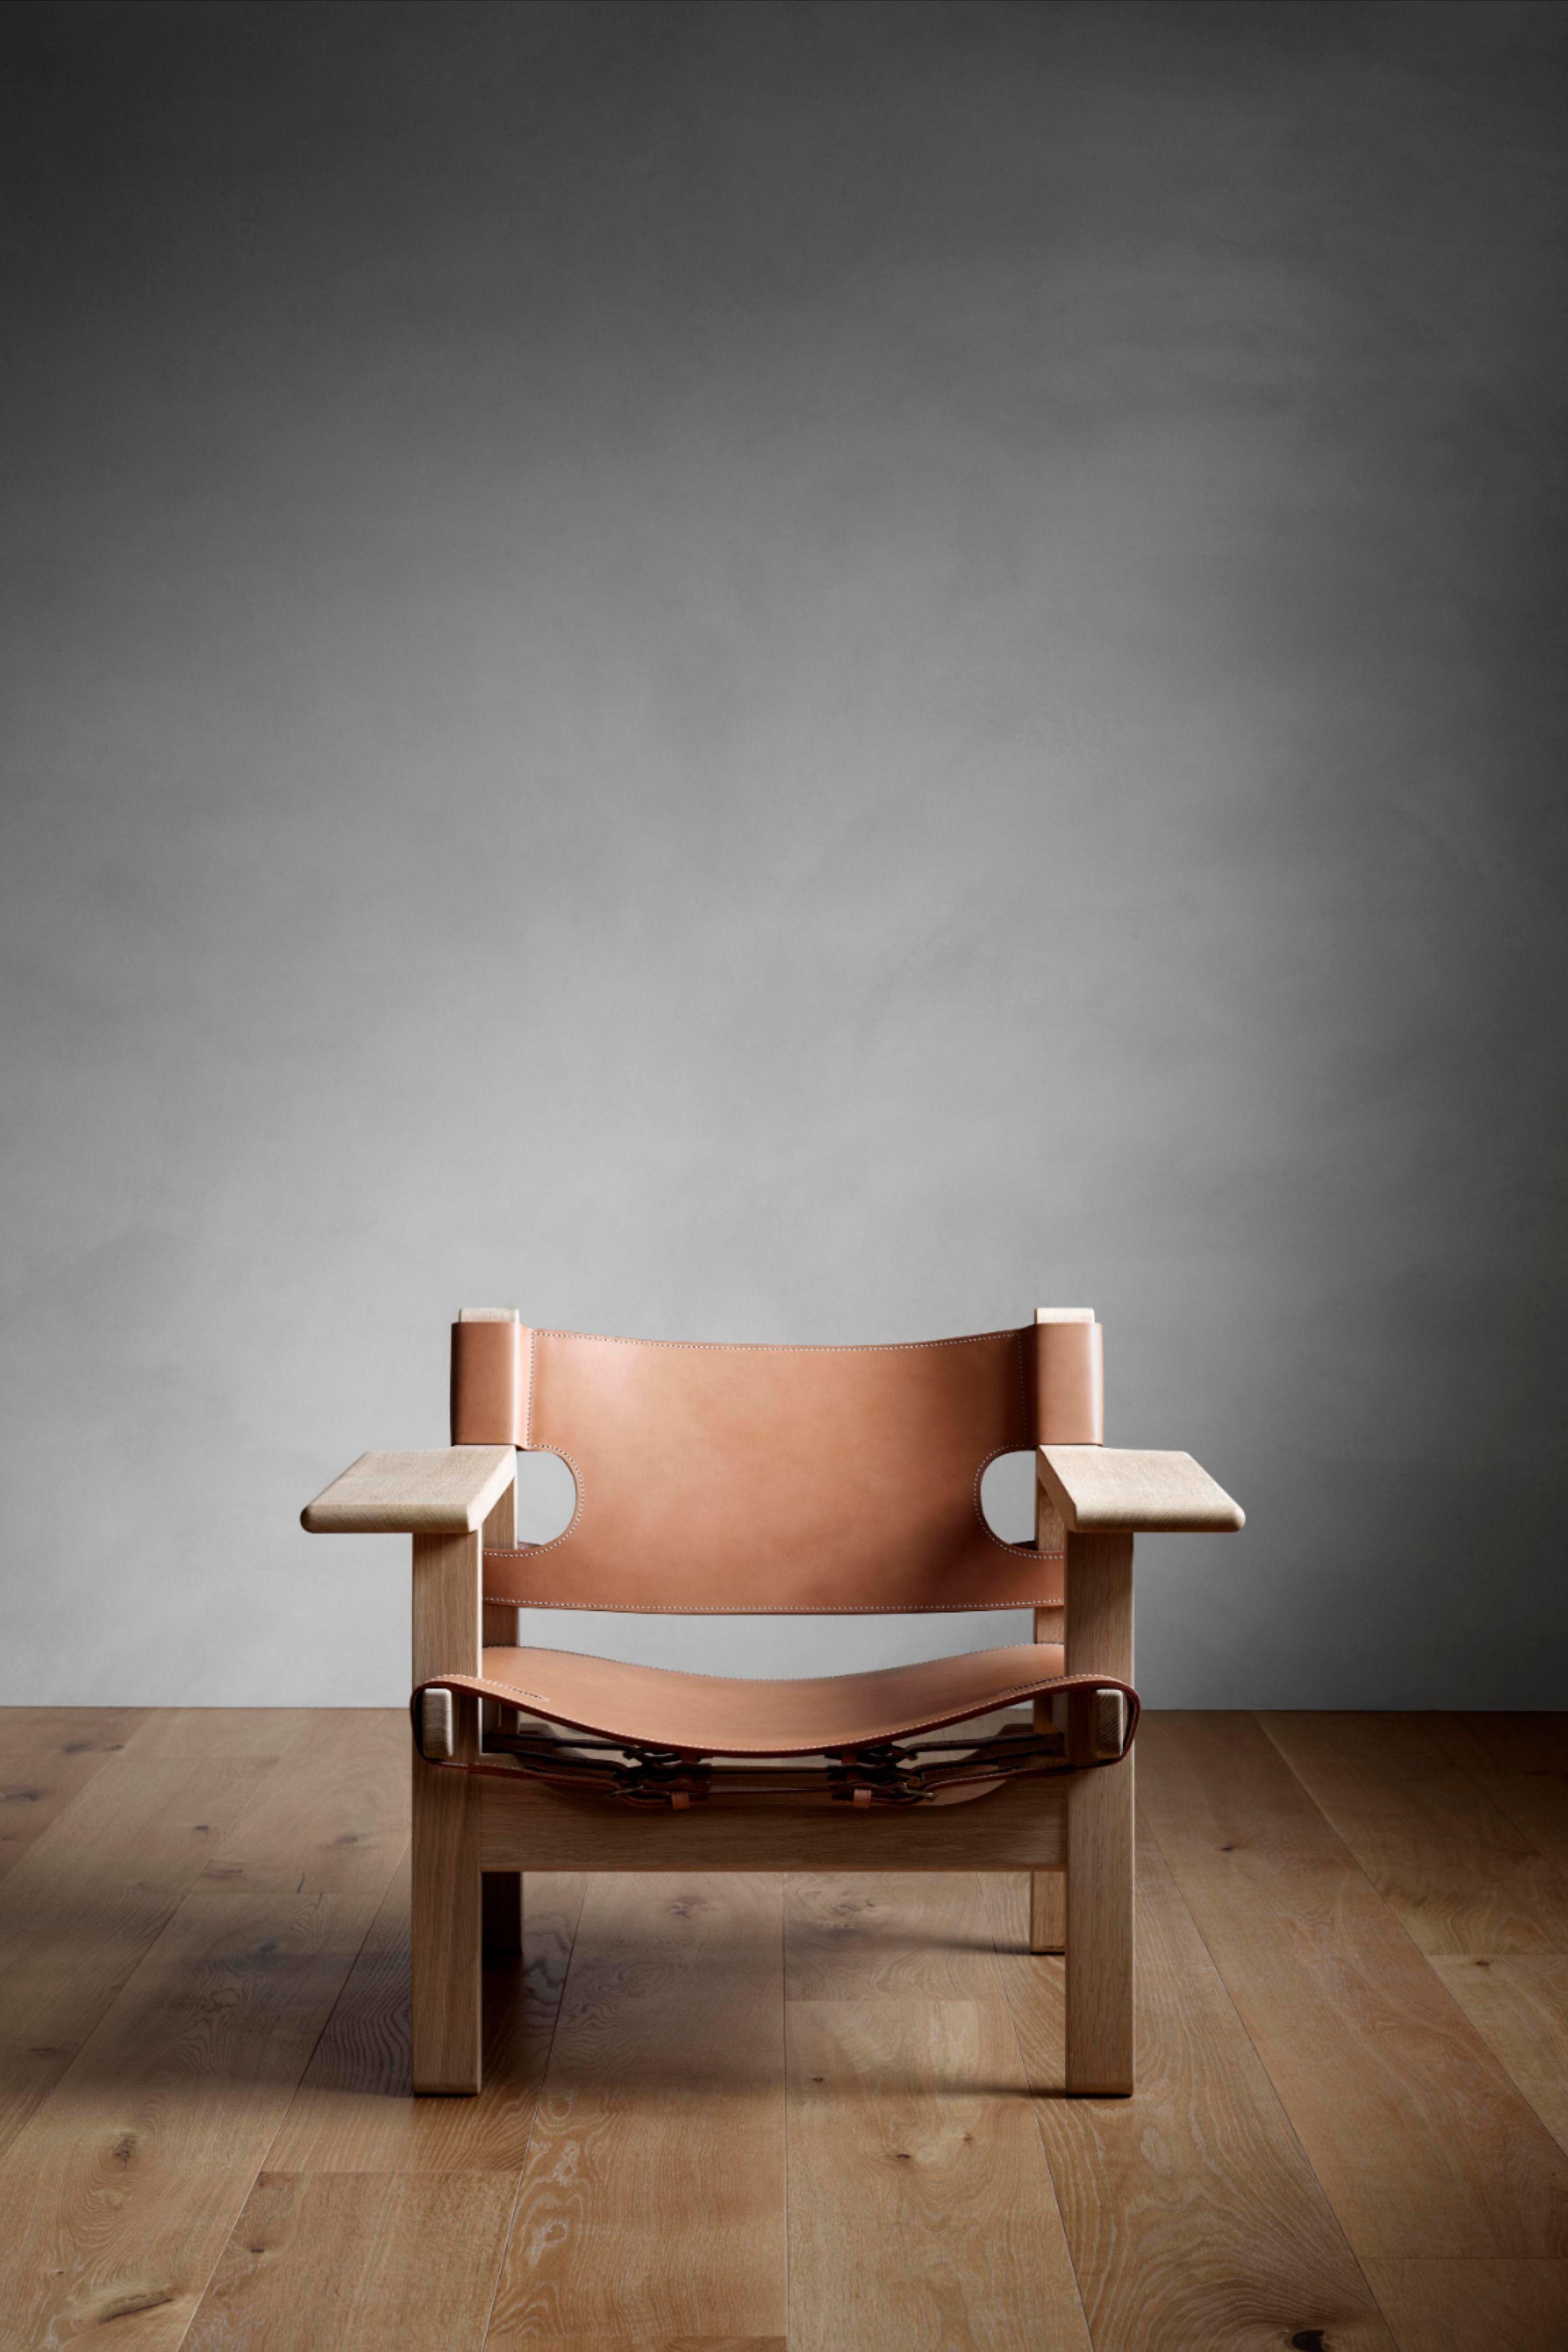 The Spanish Chair by Børge Mogensen a modern original